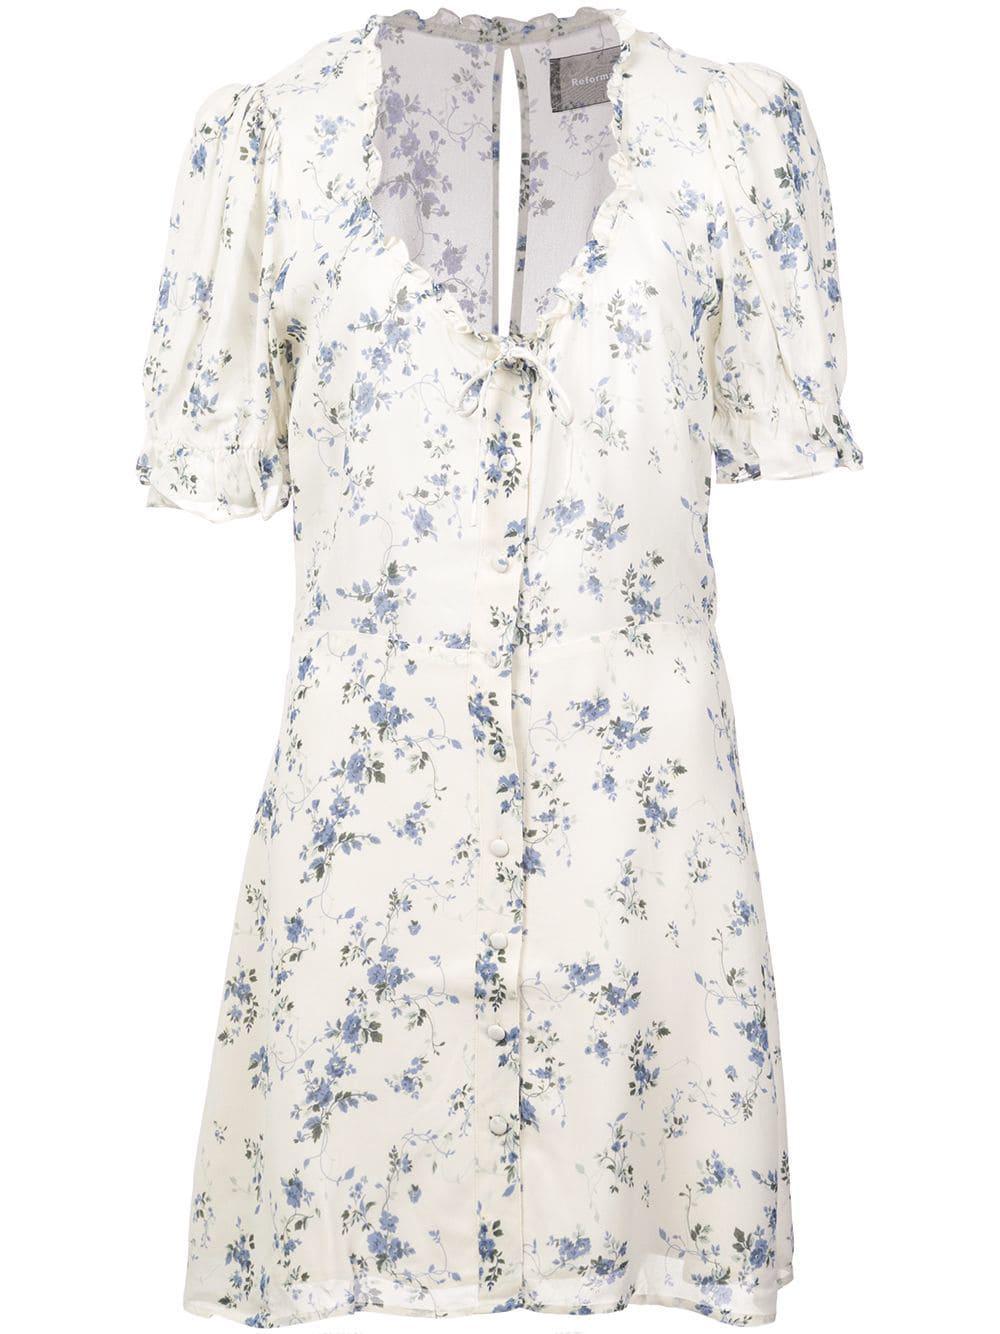 009083b90b9 Reformation Page Dress - White